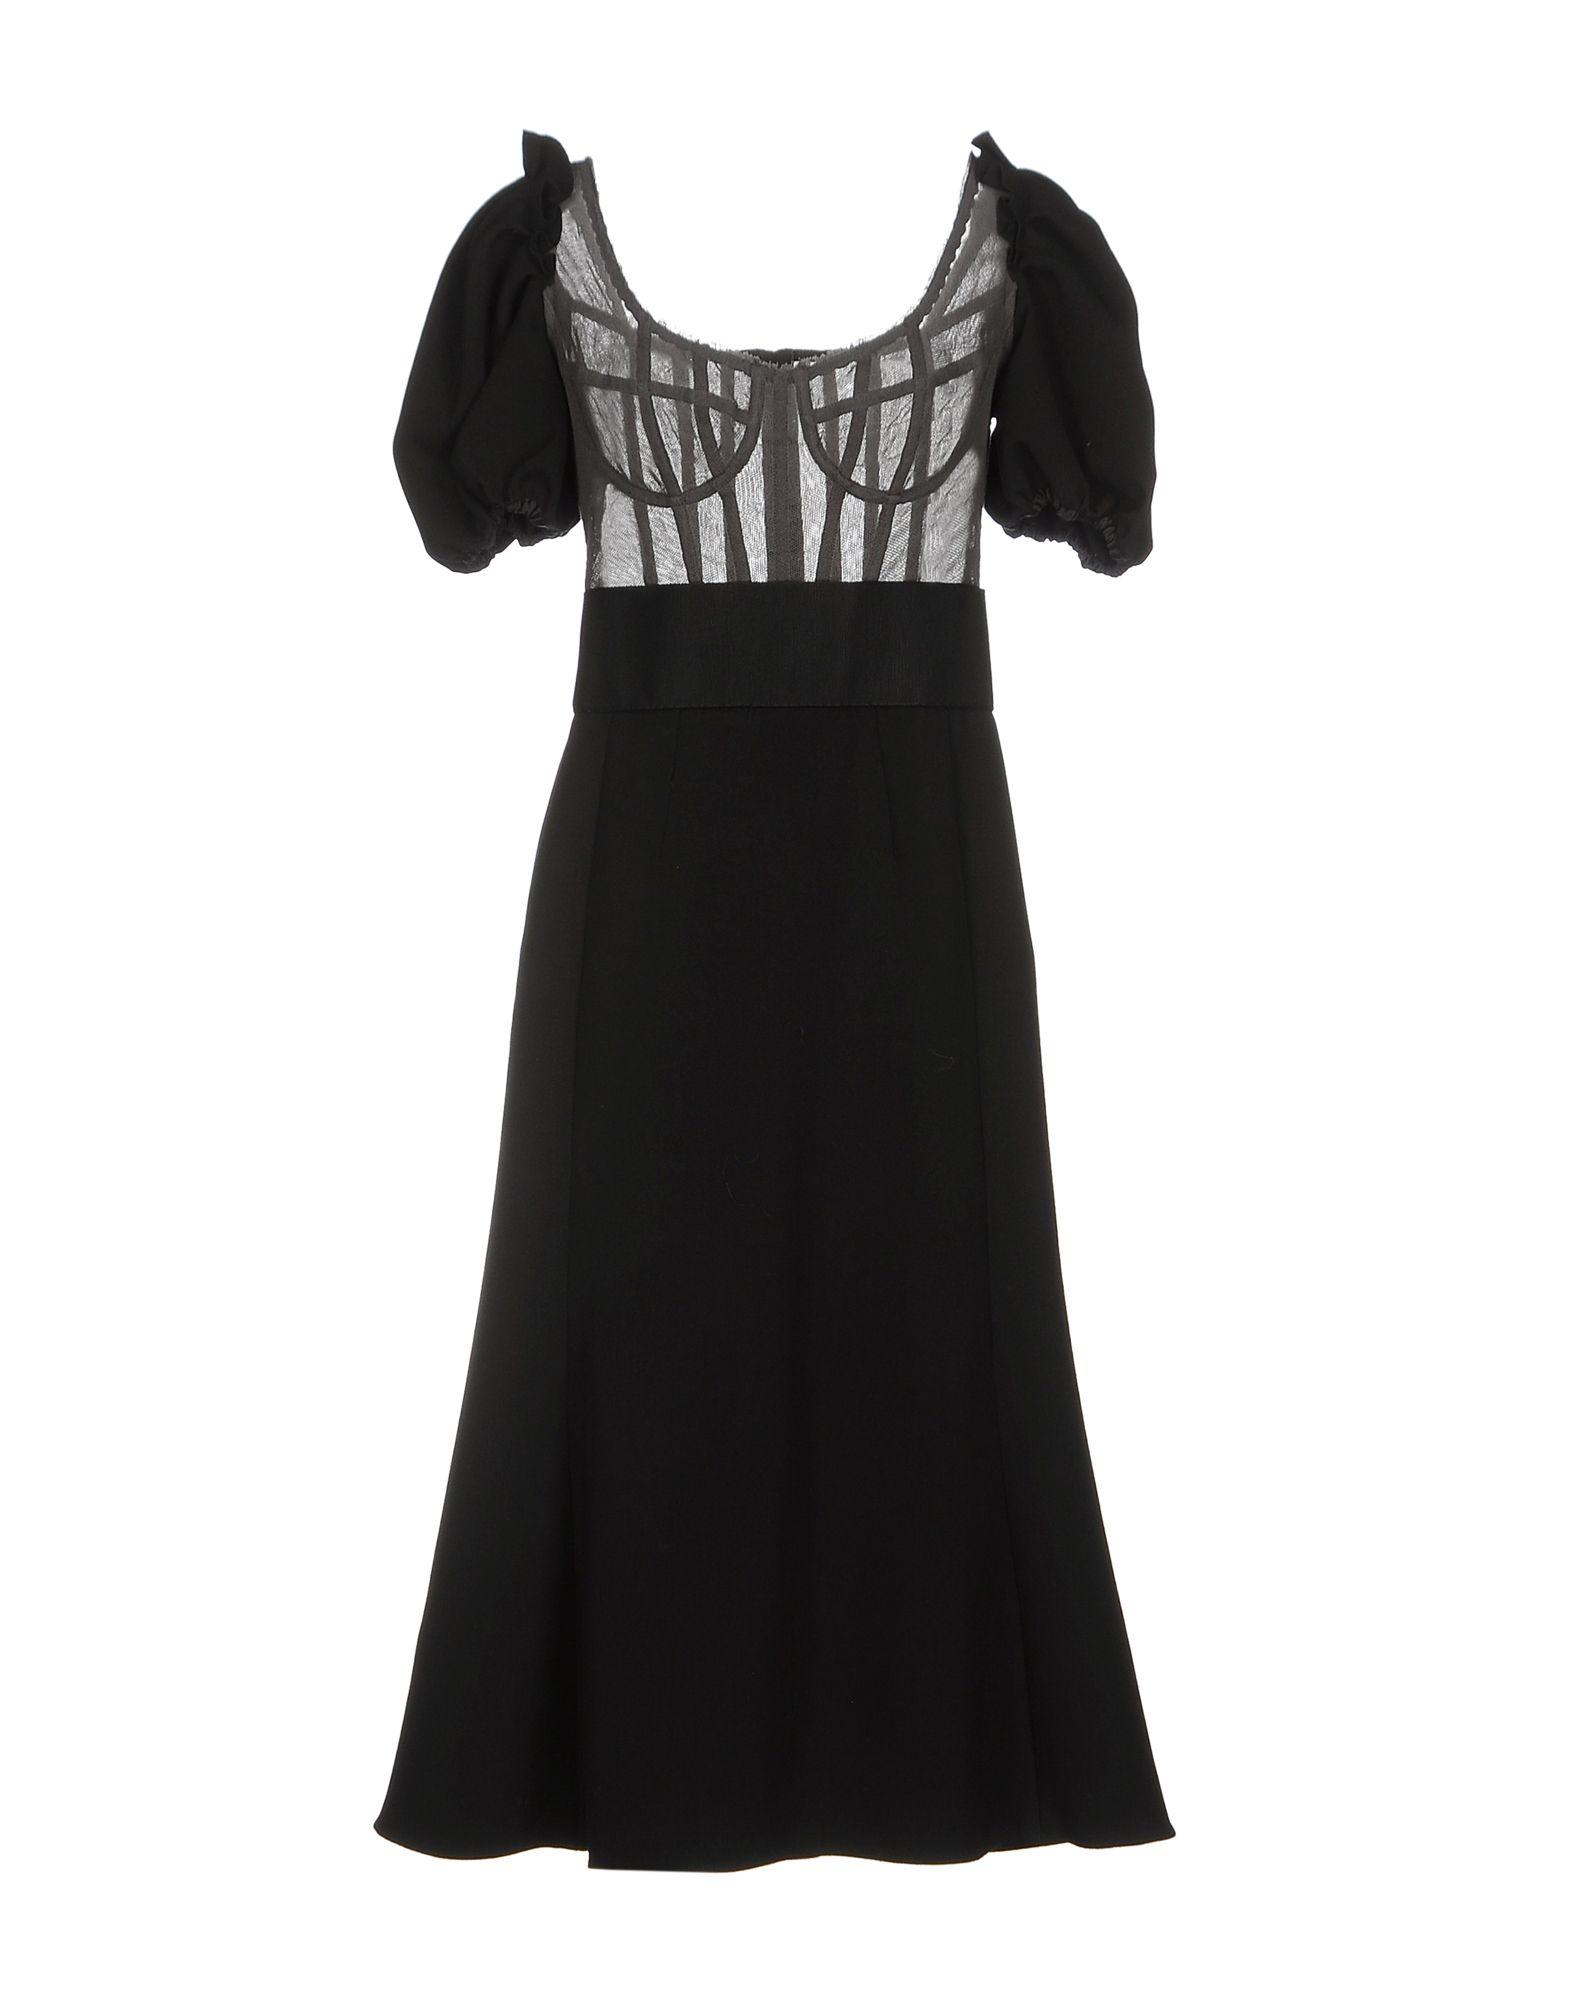 Vestito Al Ginocchio Dolce & Gabbana Donna - Acquista online su zhPDpWmit